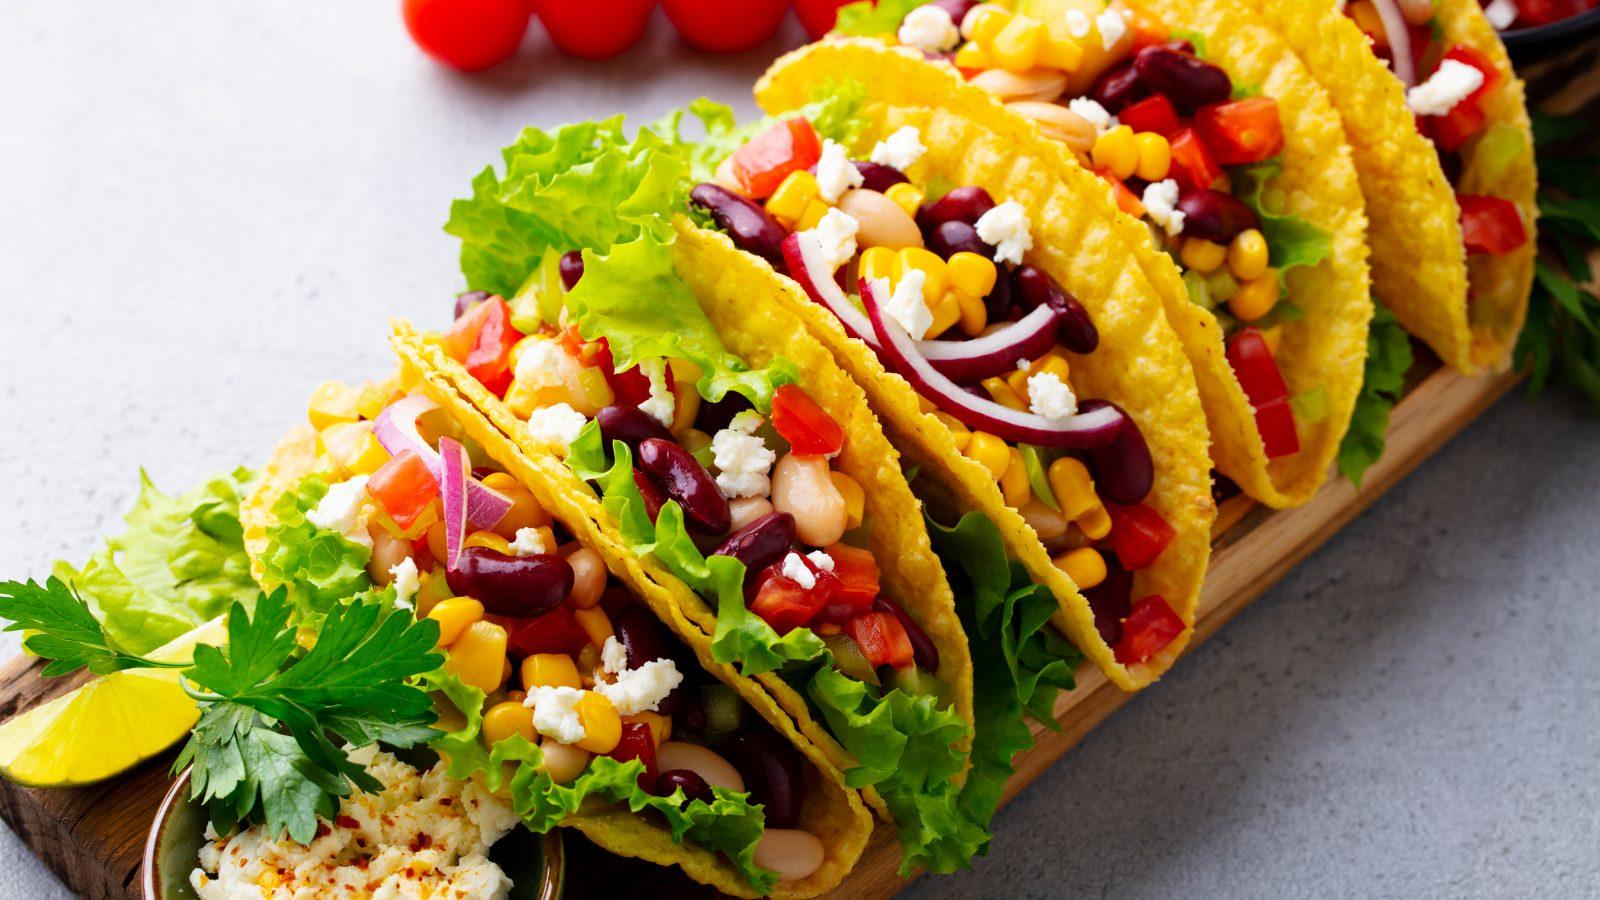 photo of several vegetarian tacos